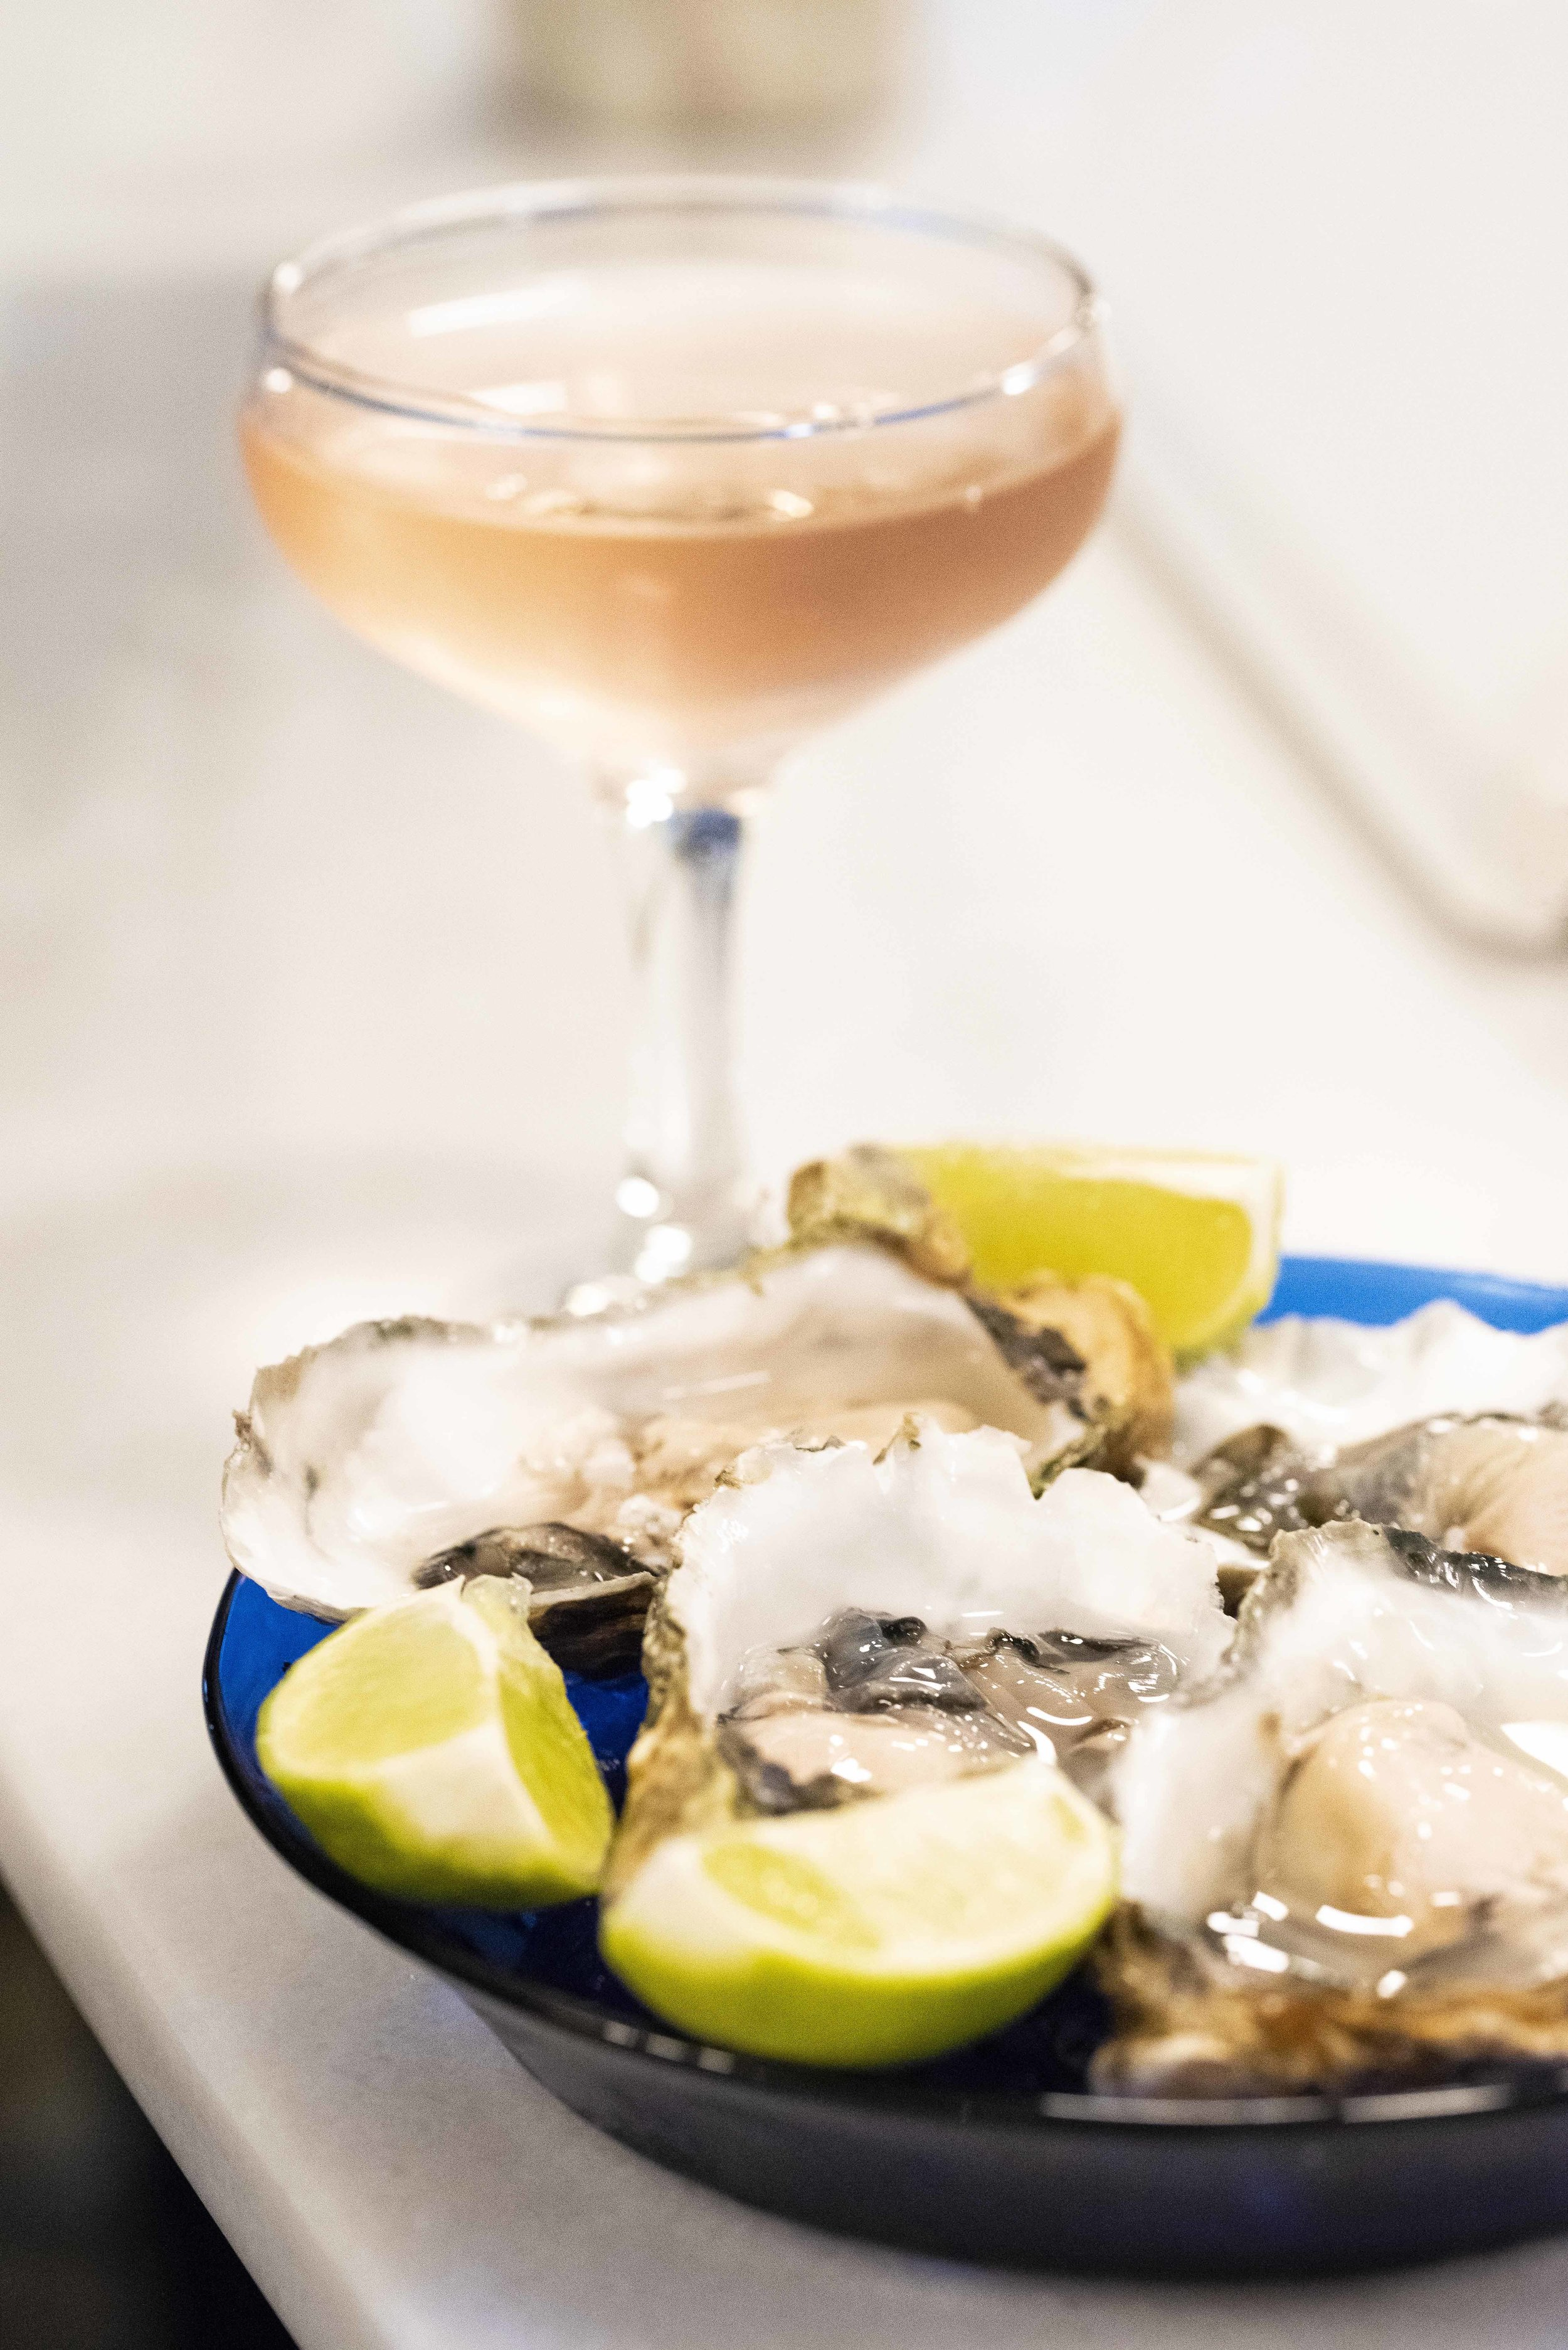 Oysters at Atlantis Gastrobar, Barcelona. Photo © Barcelona Food Experience.